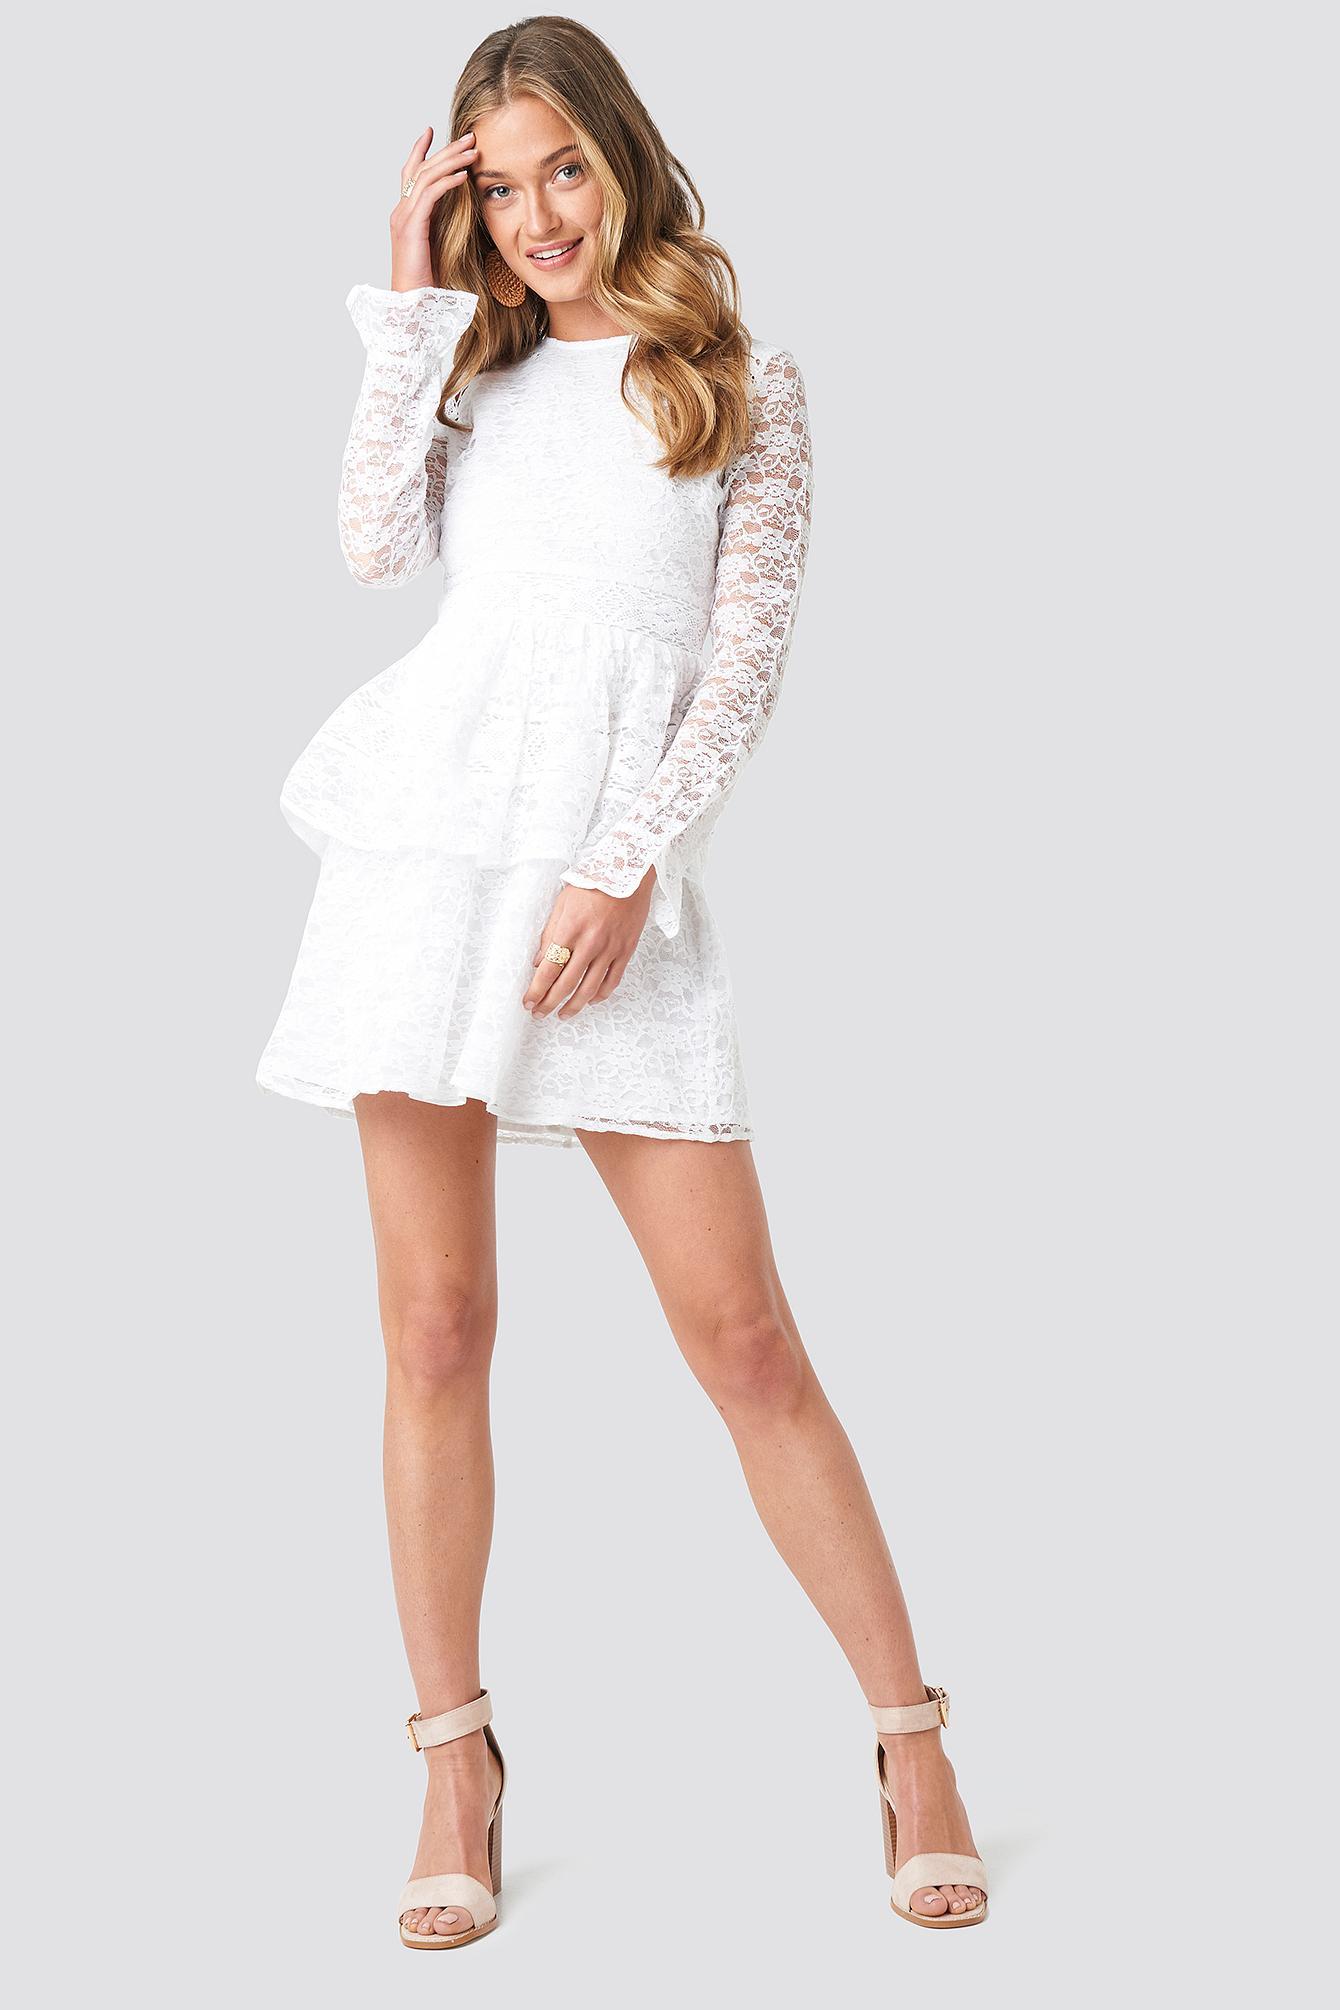 All Over Lace Midi Dress NA-KD en coloris Blanc